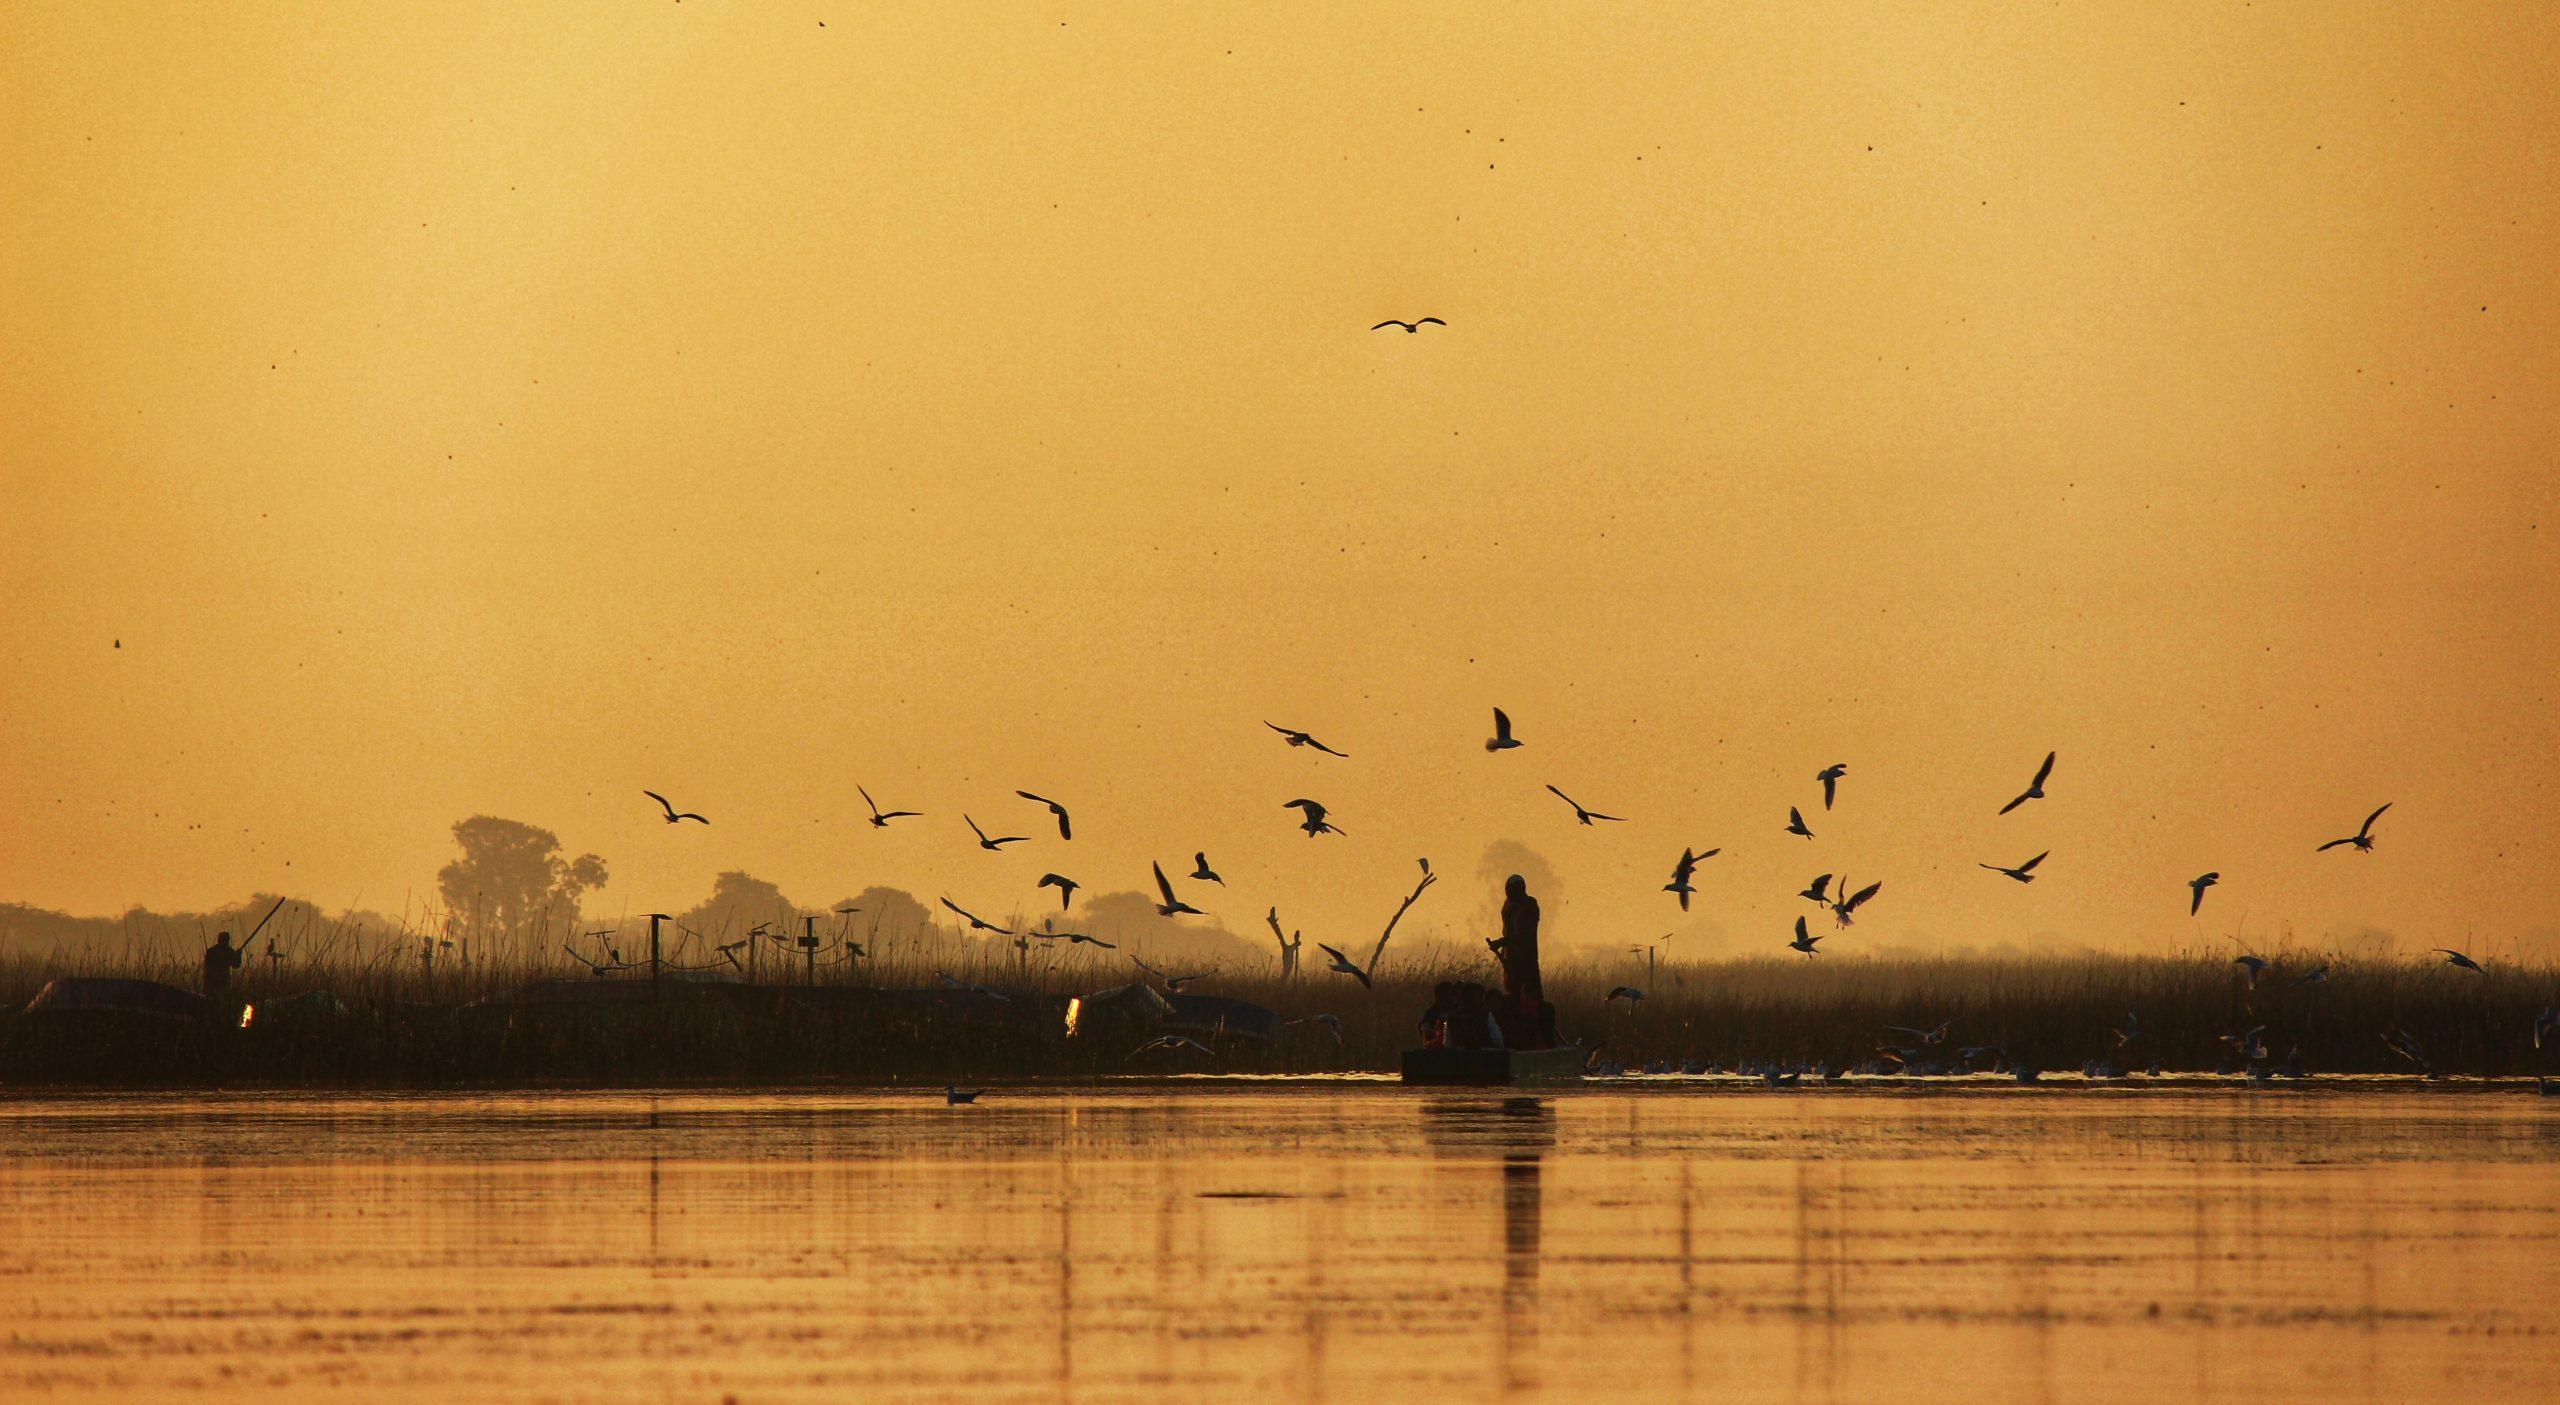 flock of bird flying